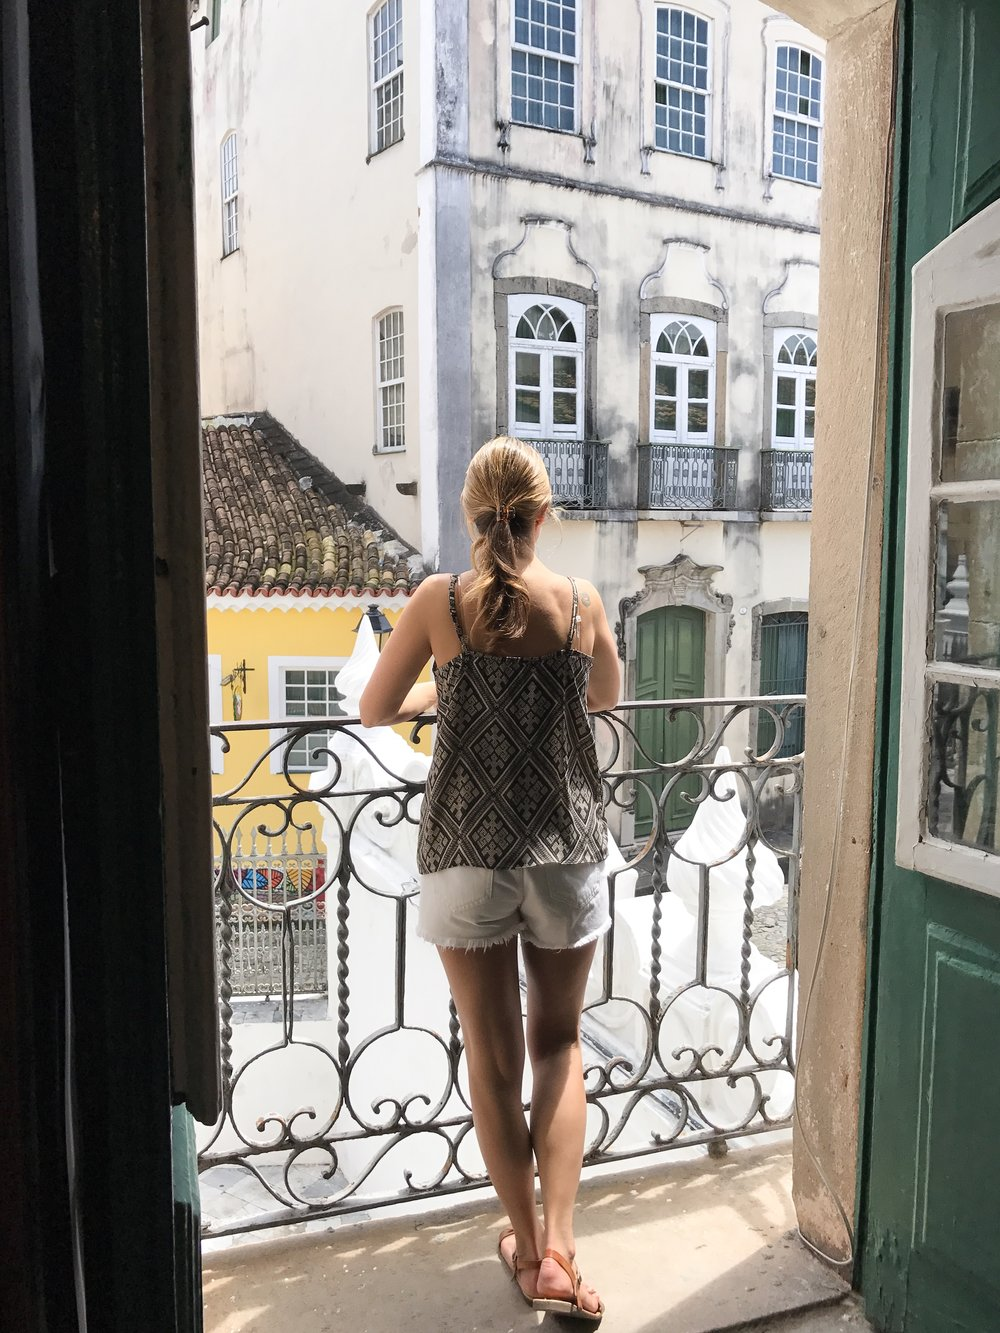 viajar sola 2 Viajar Inspira